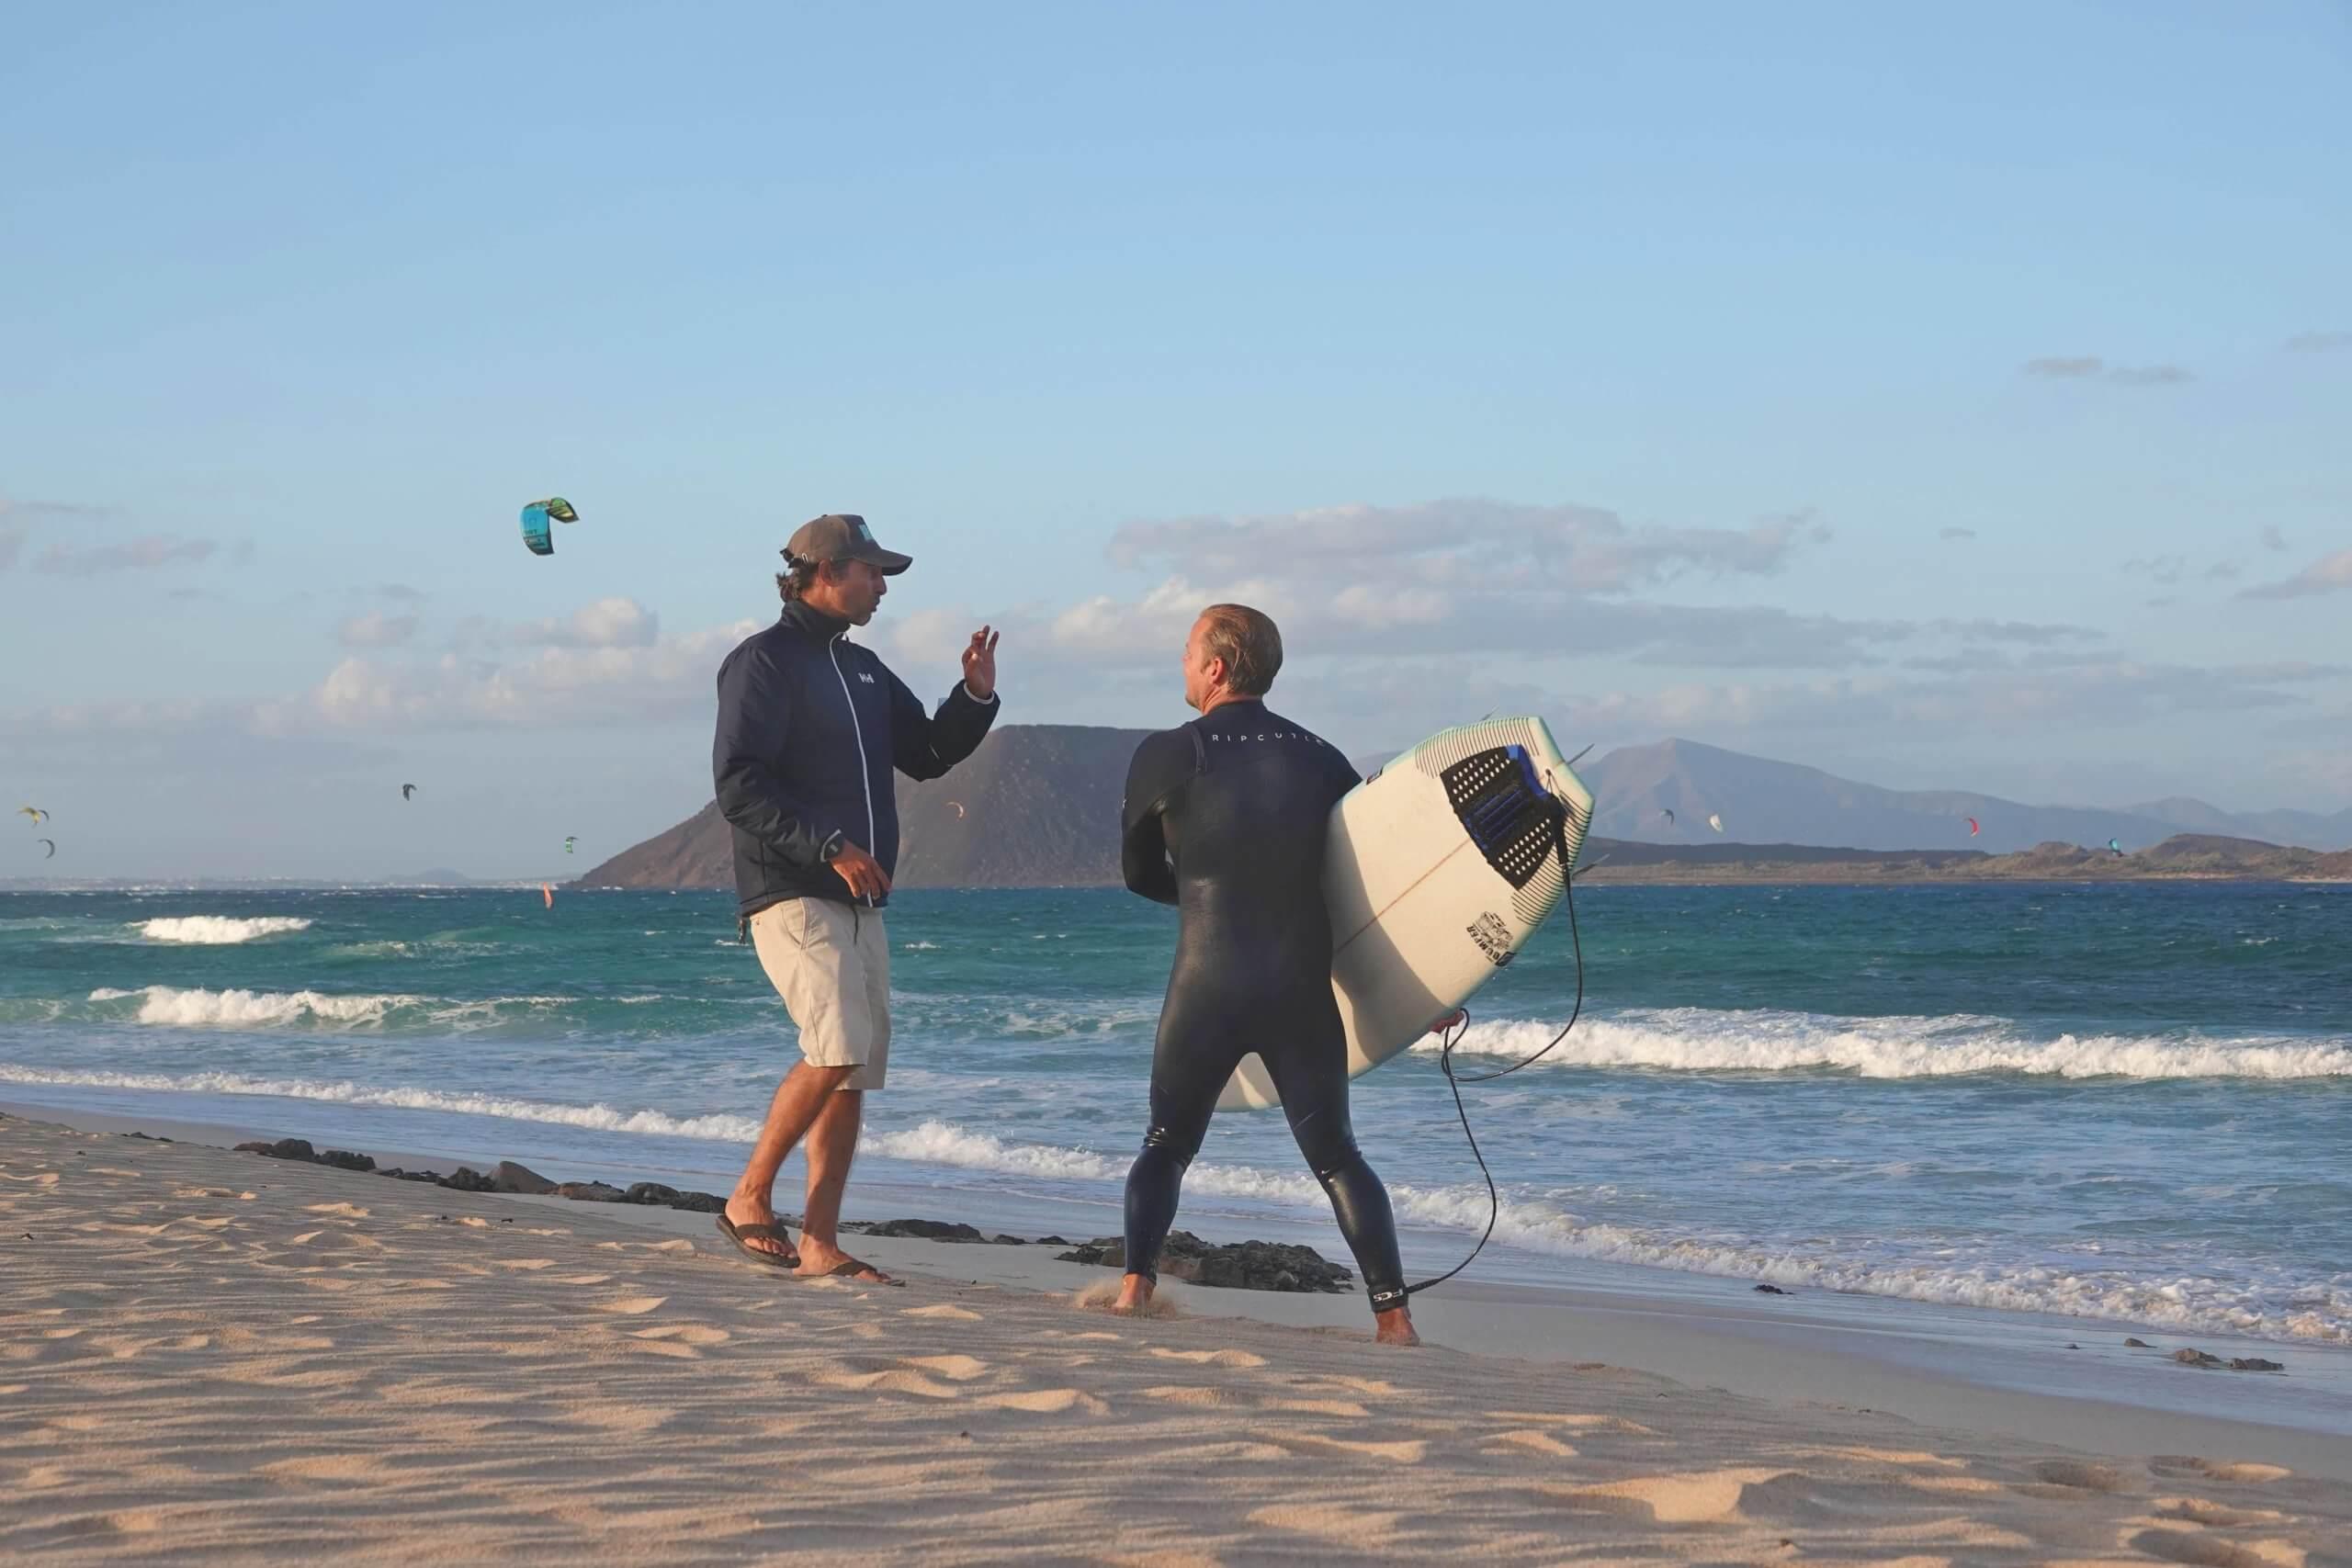 Surf Coach Jona gibt Feedbak